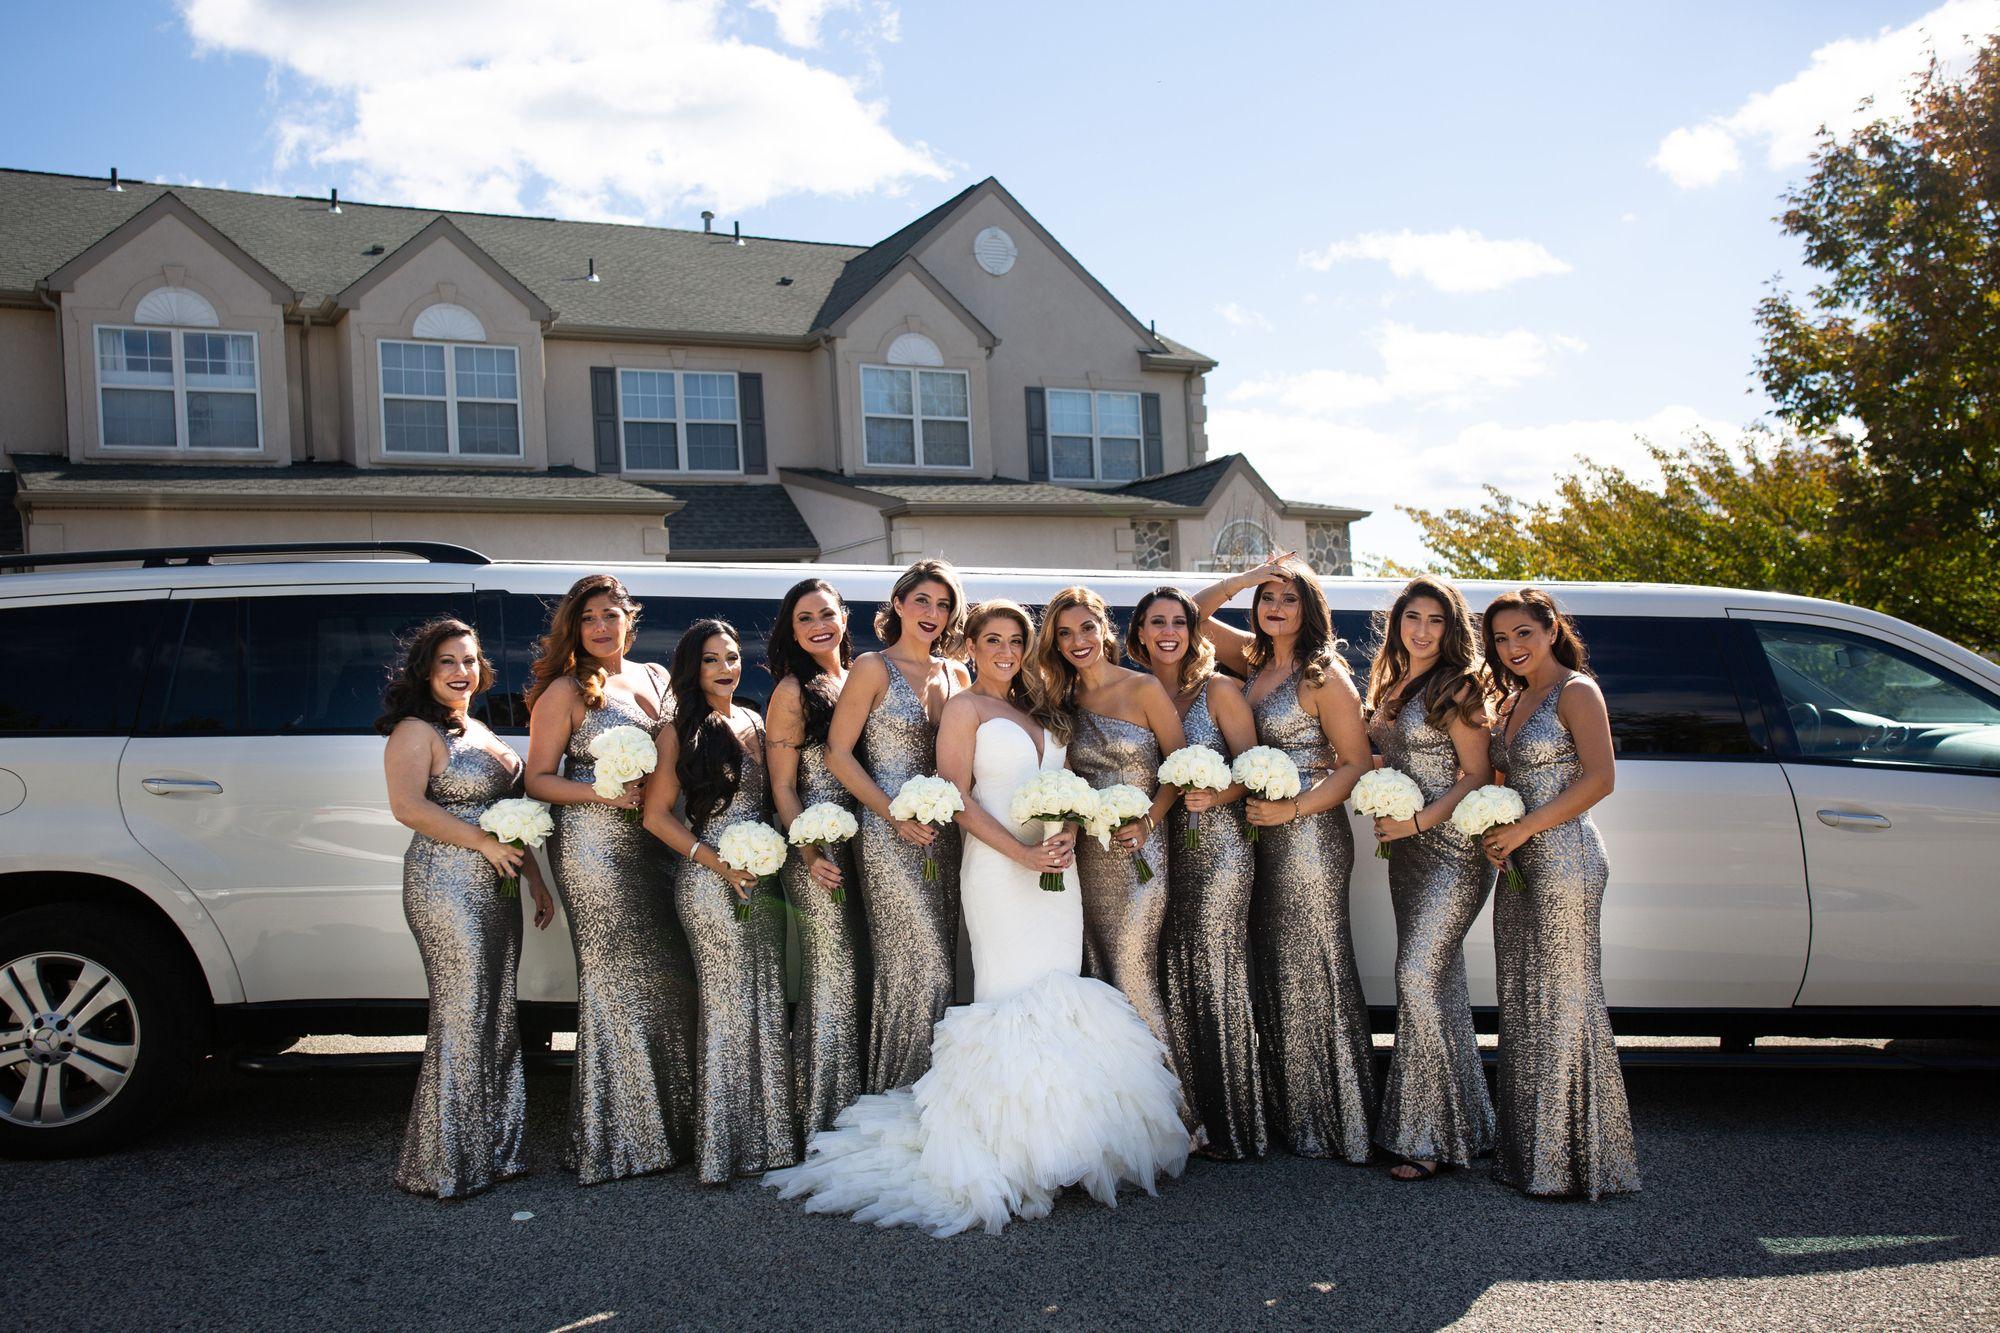 bridesmaids dresses/ wedding limo/ bride and bridesmaids